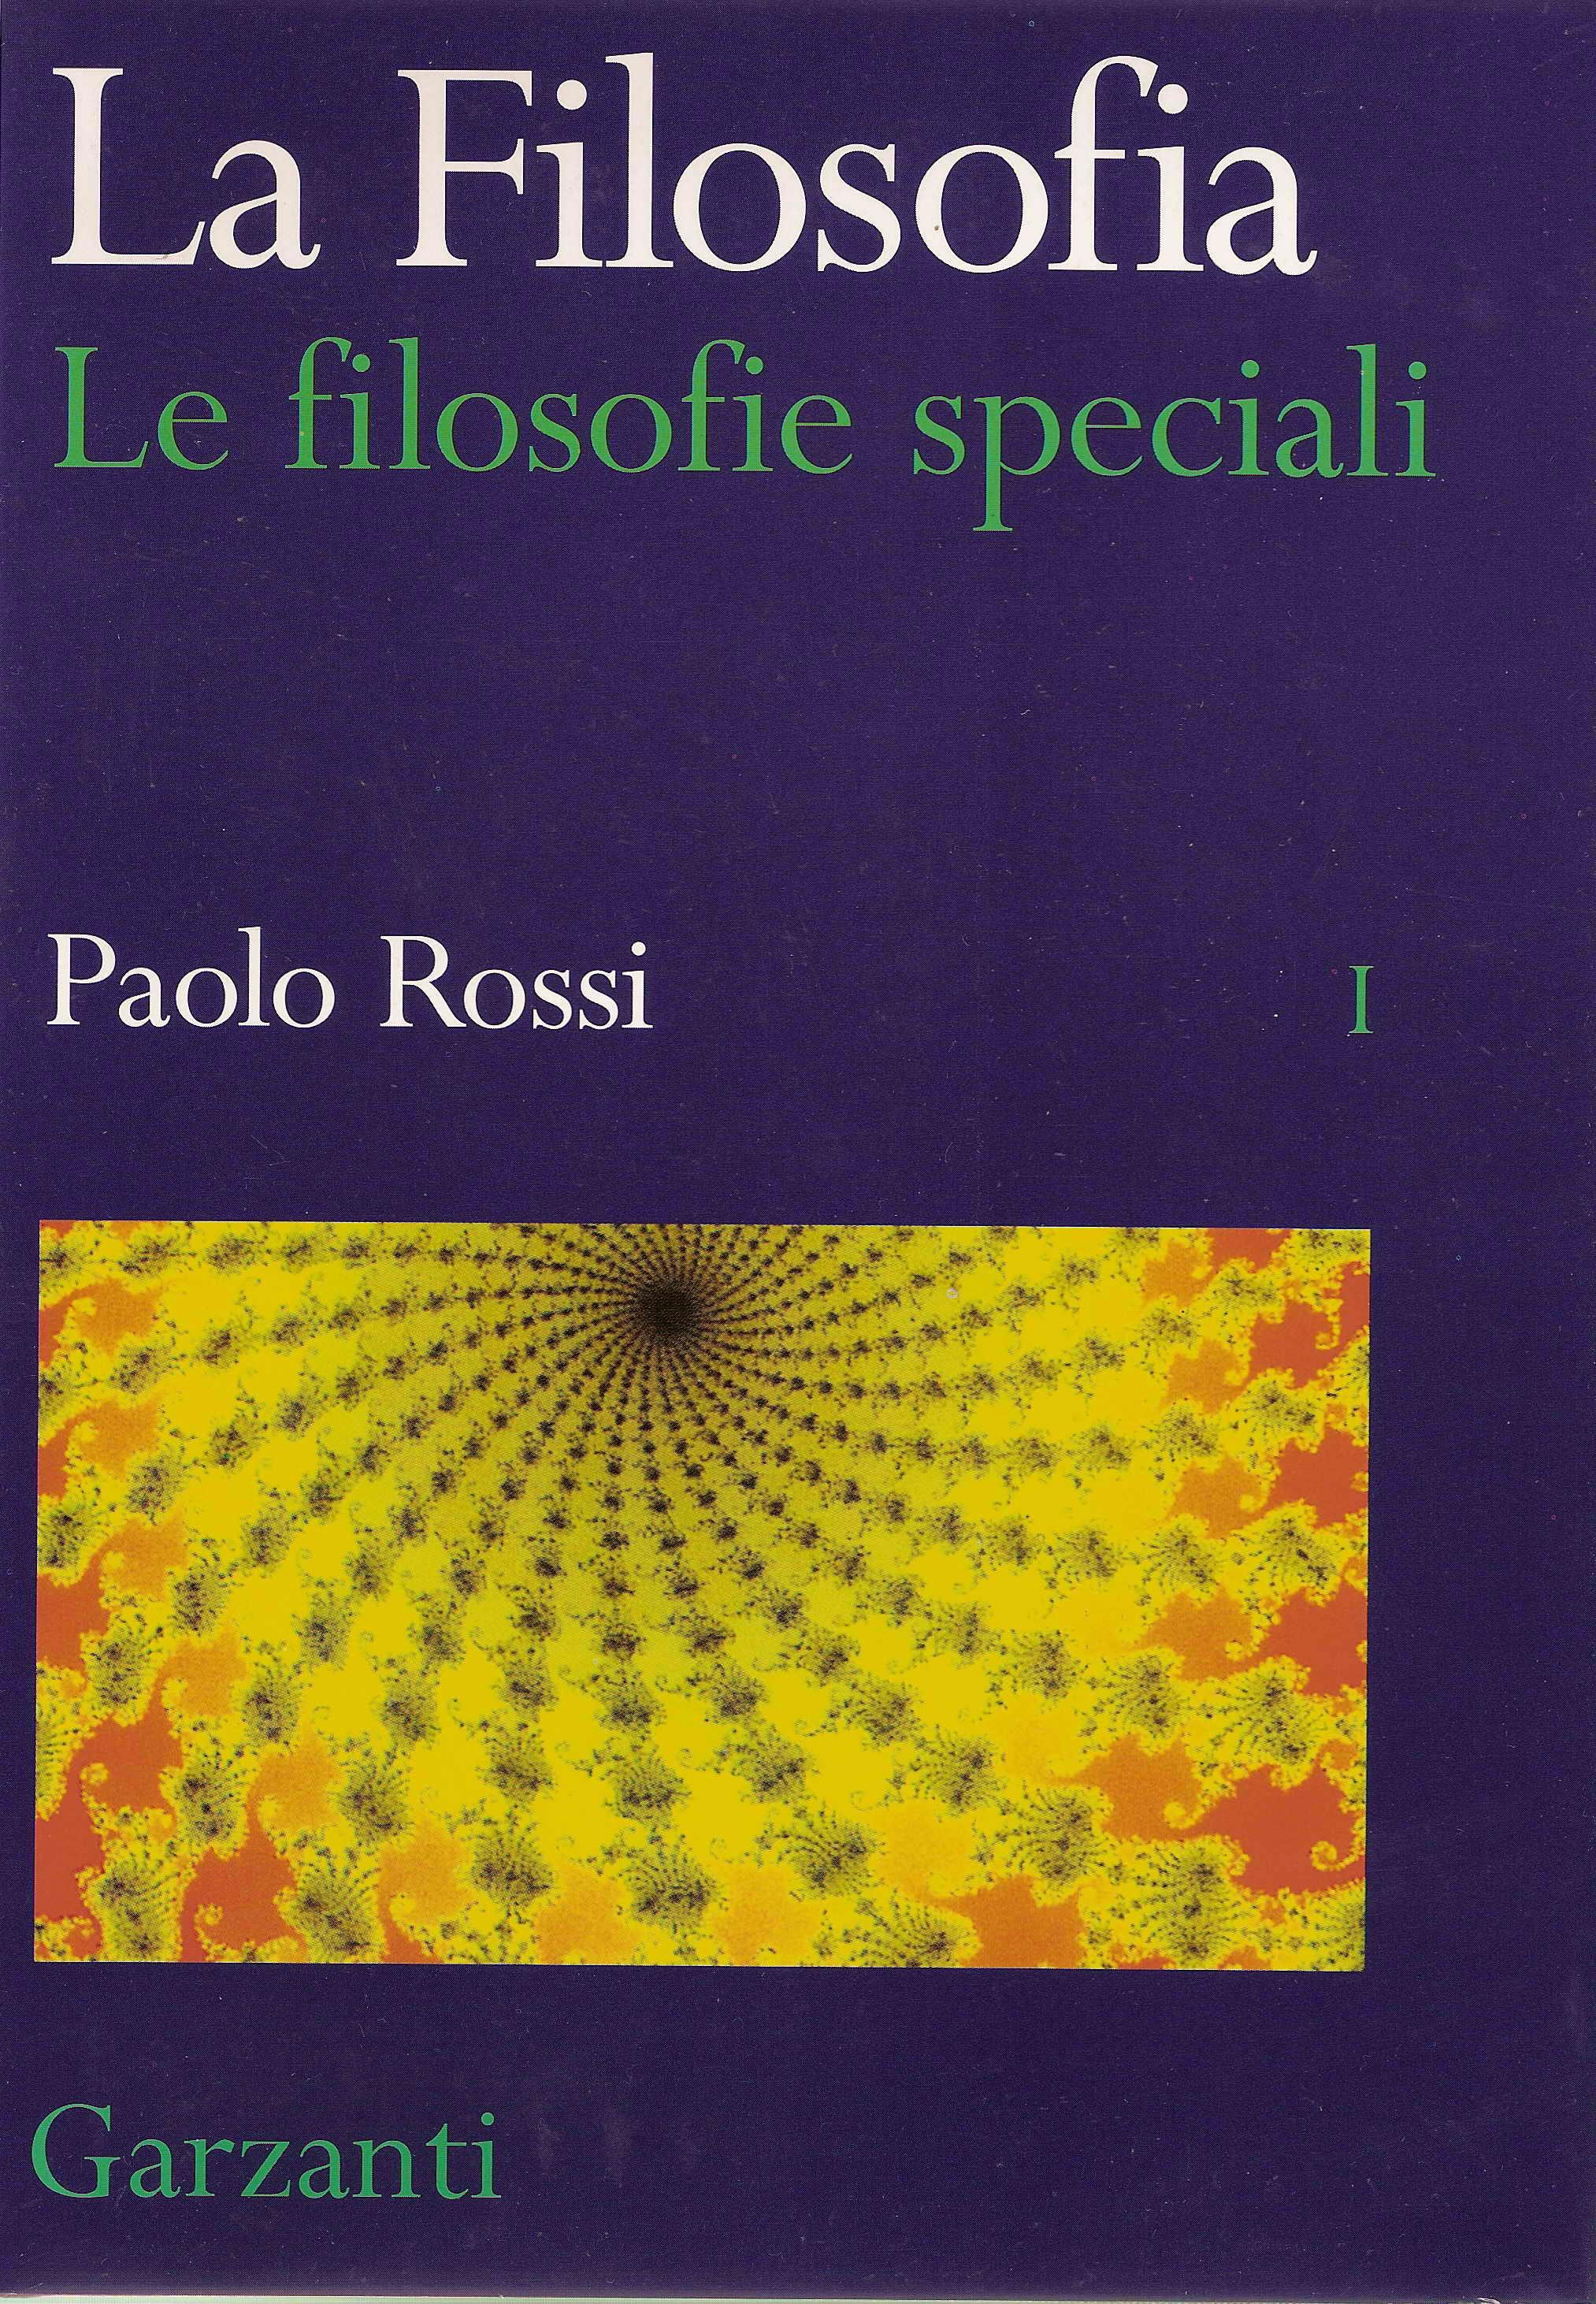 La Filosofia - Le filosofie speciali